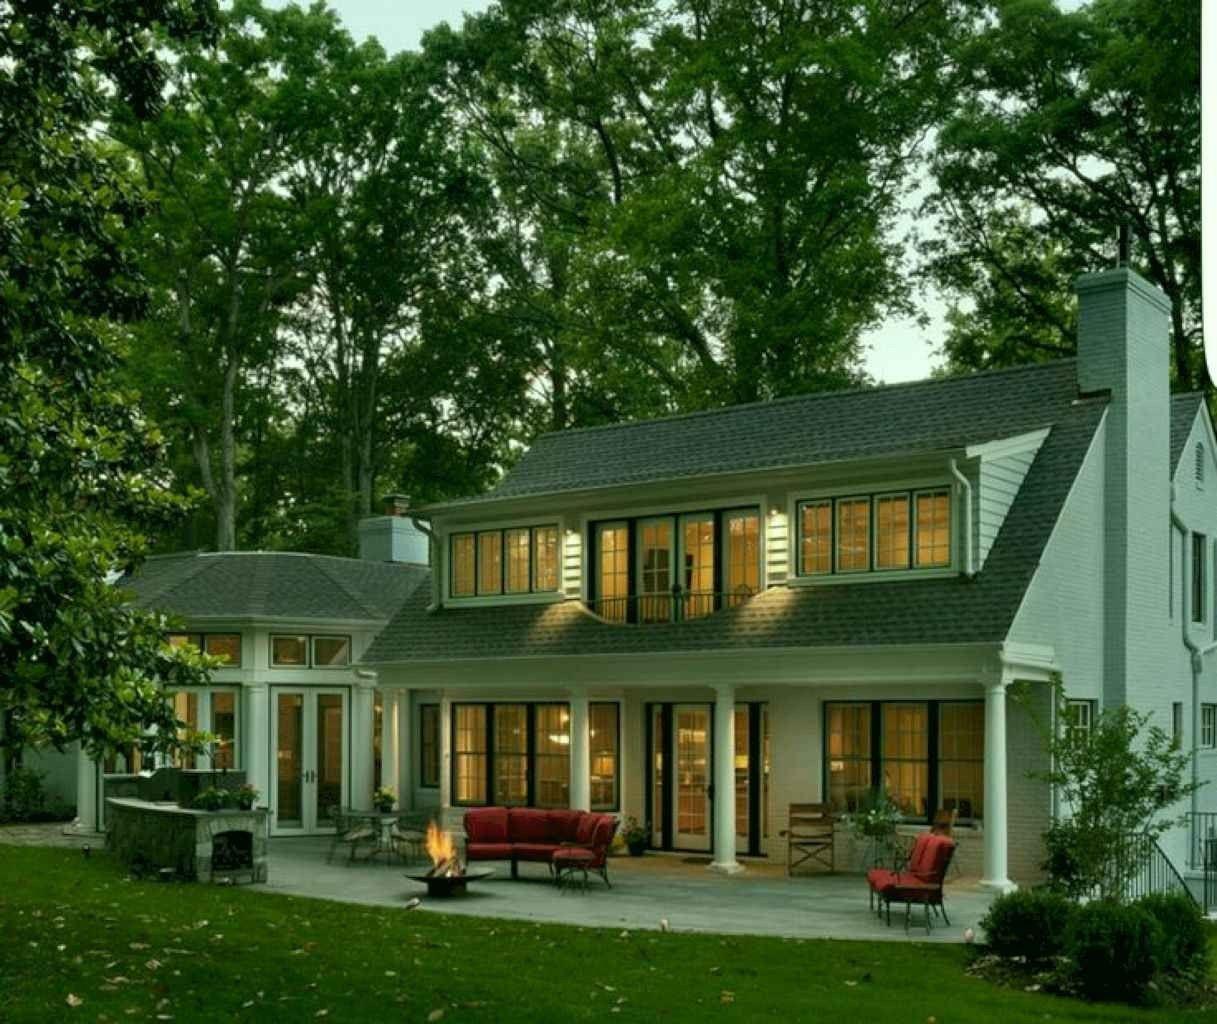 46 Conventional Cape Cod House Exterior Ideas Dormer House Cape Cod Exterior Shed Dormer